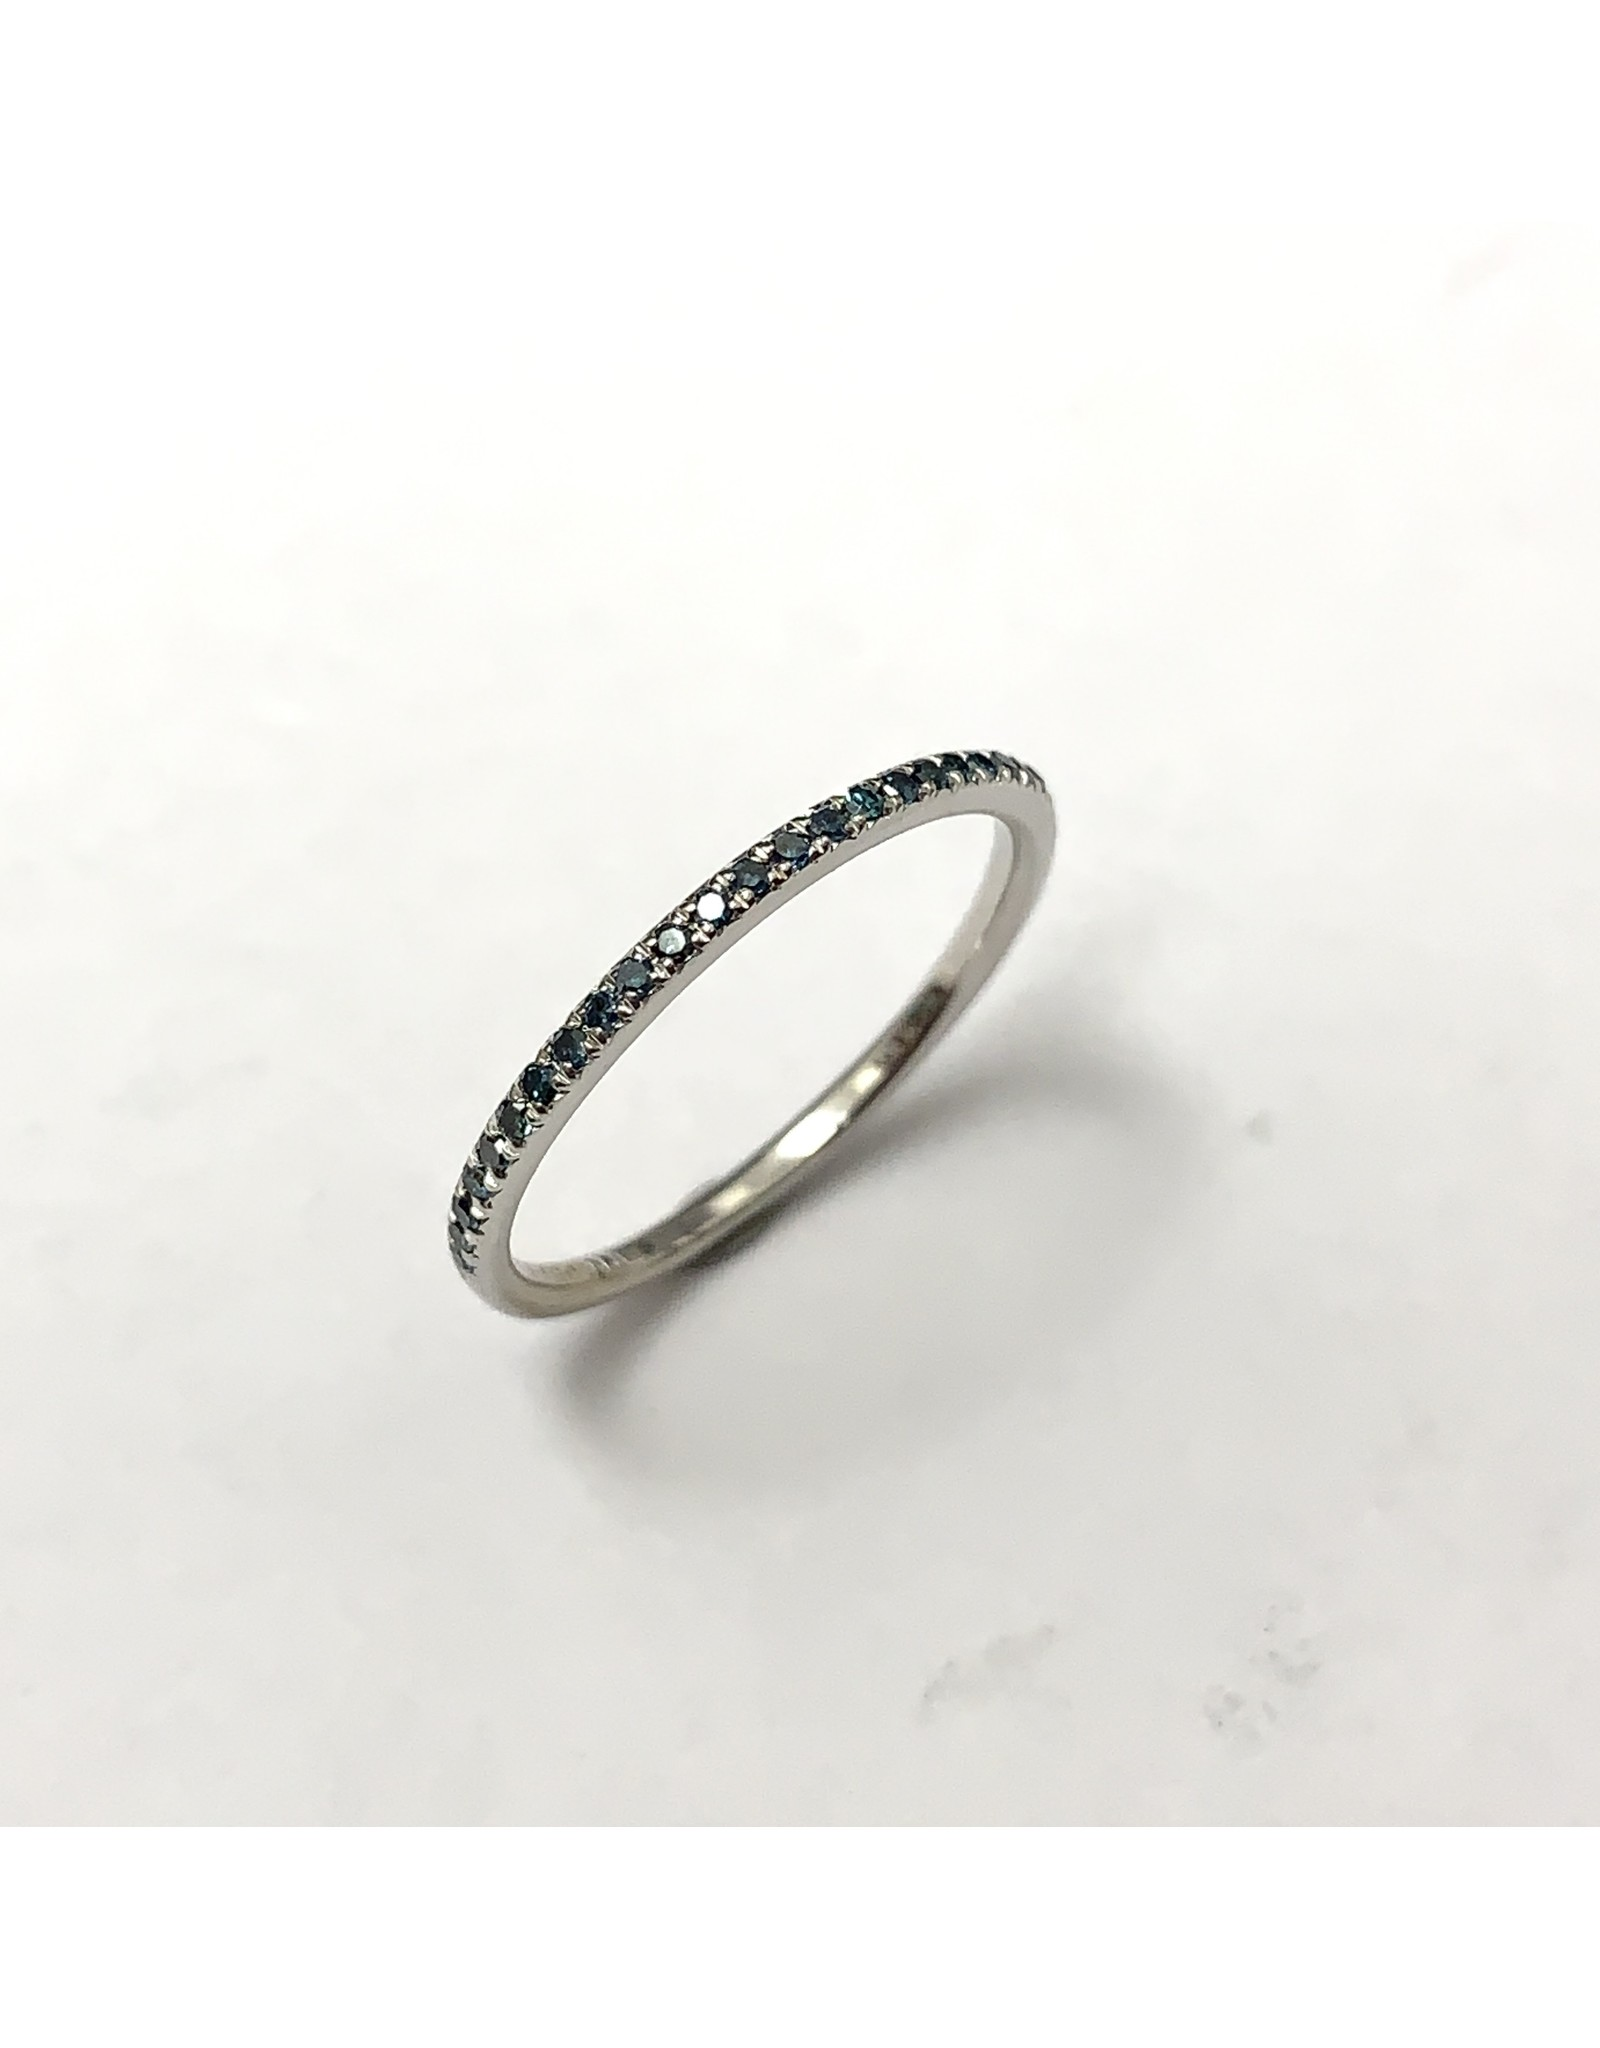 Chi Chi Blue Diamond Ring 10KW